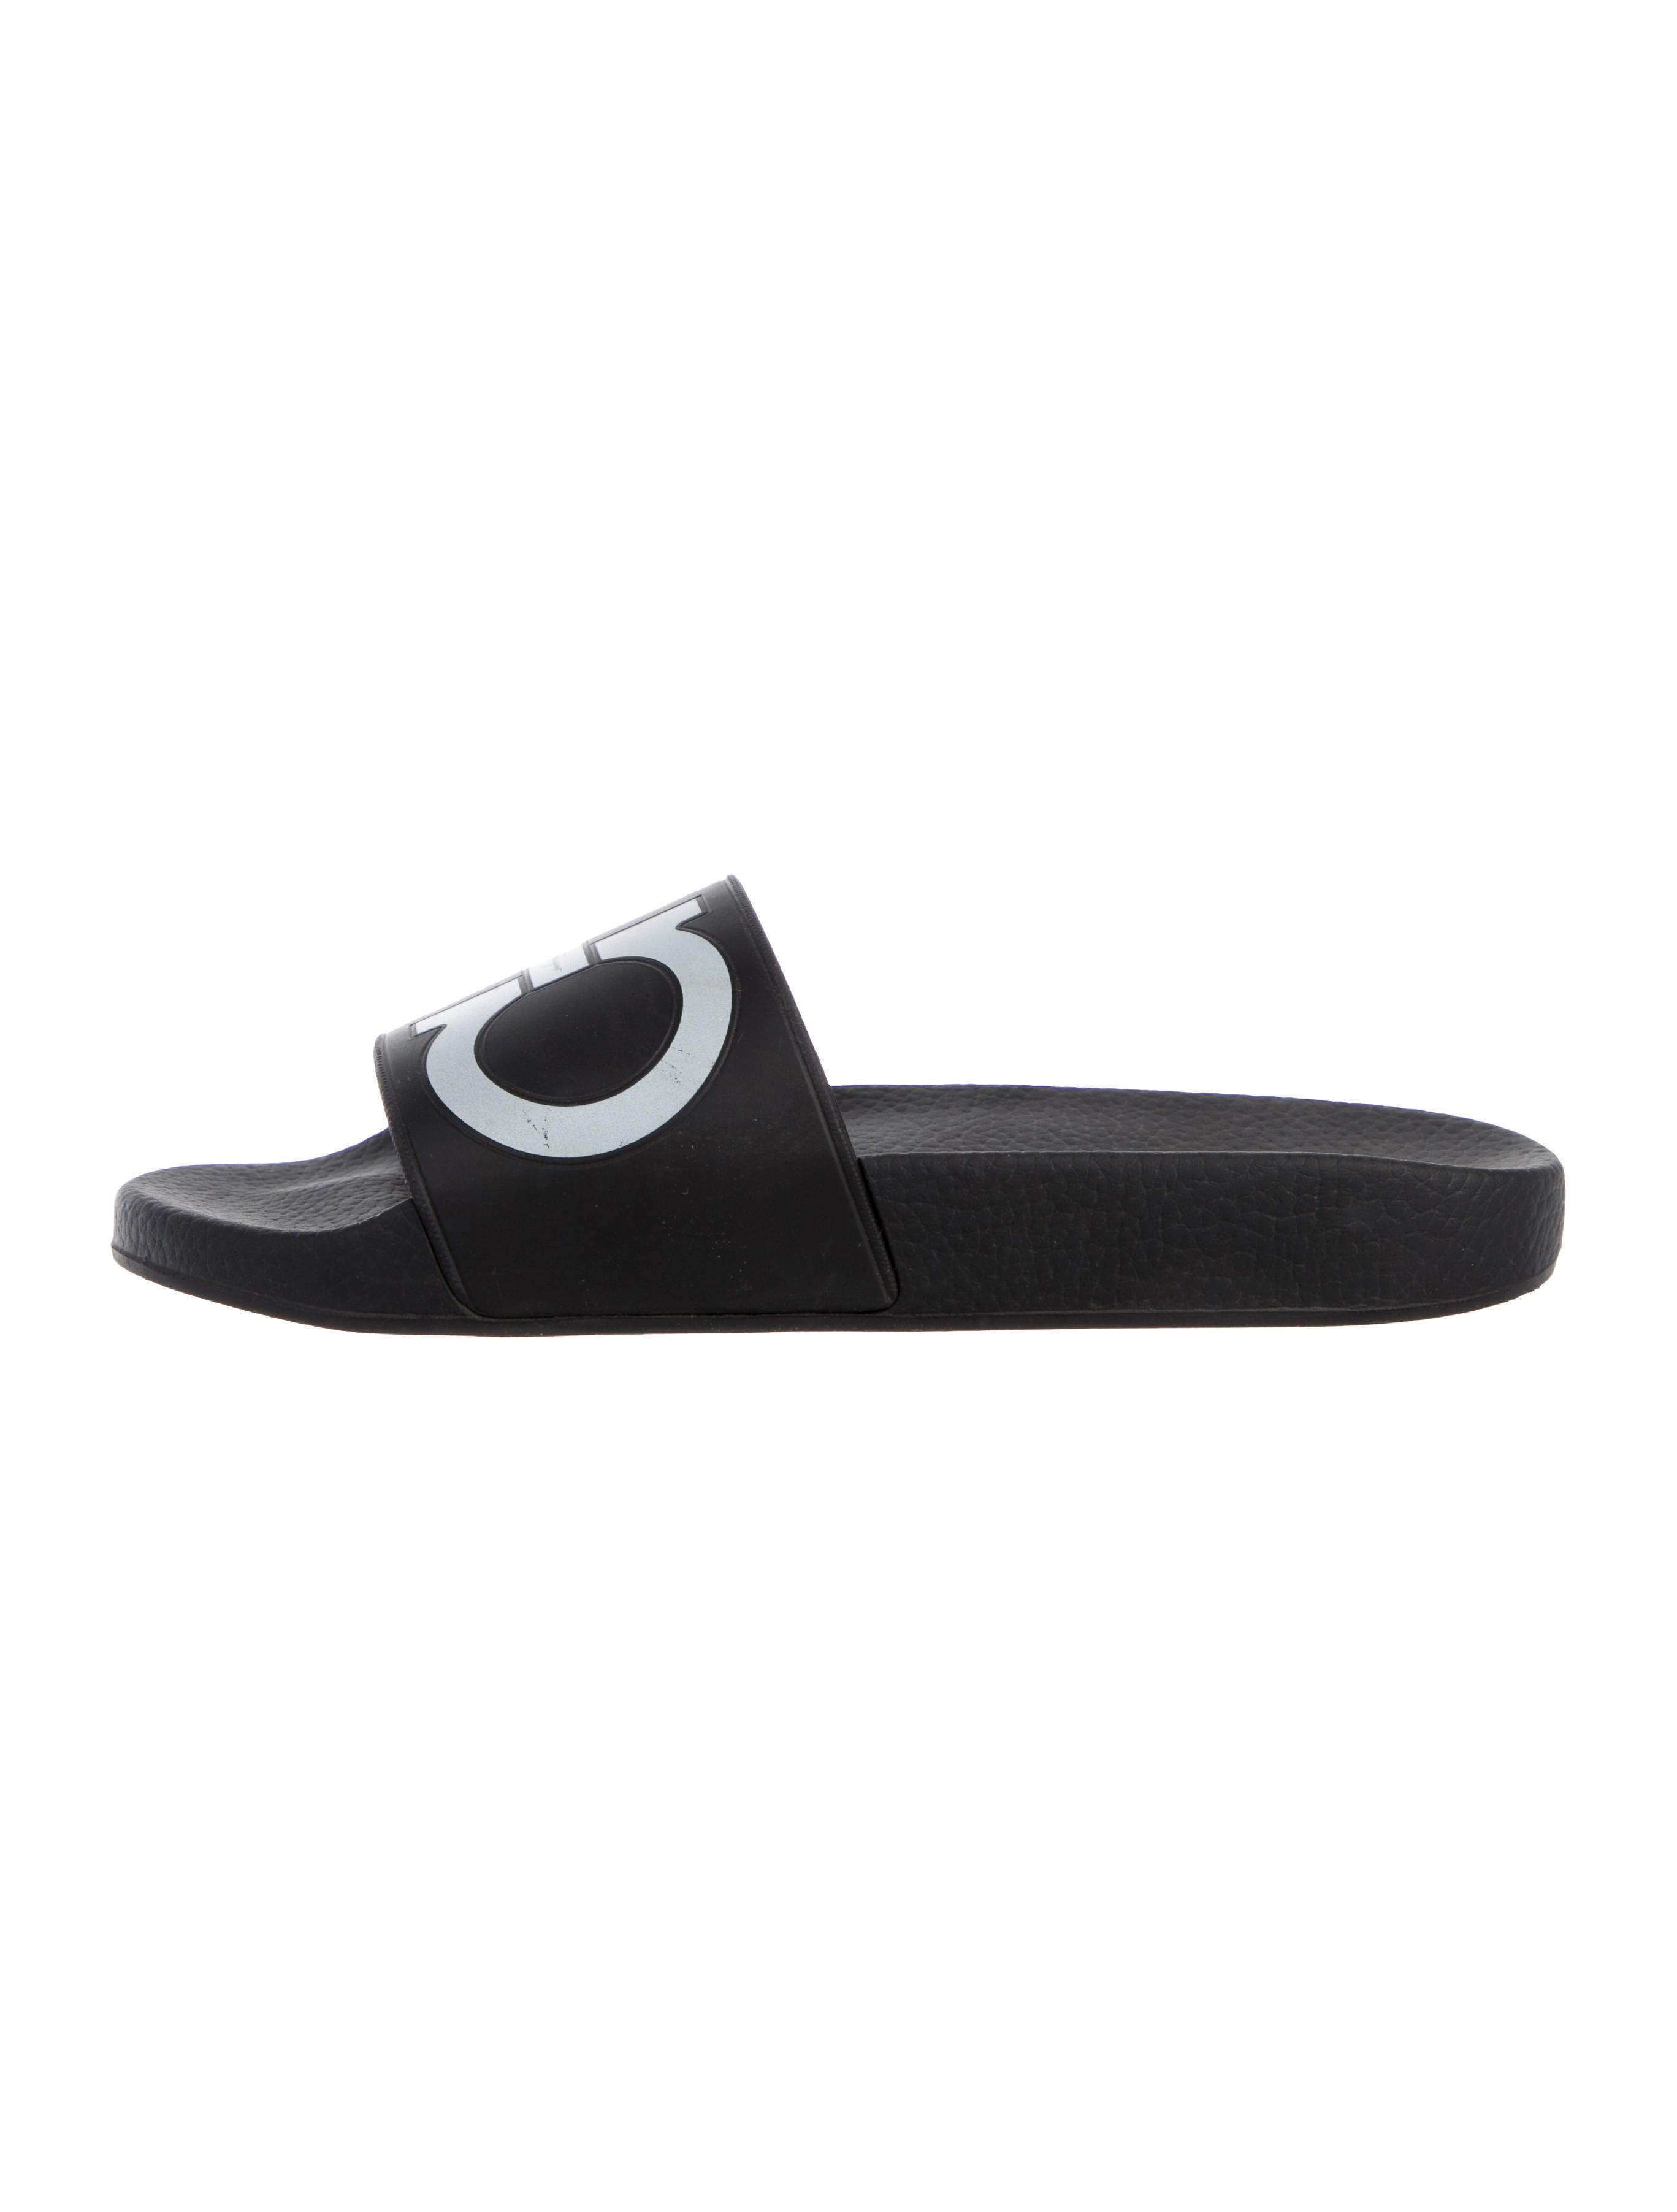 df5563af7bfb Women · Shoes  Salvatore Ferragamo Groove Pool Slide Sandals. Groove Pool  Slide Sandals